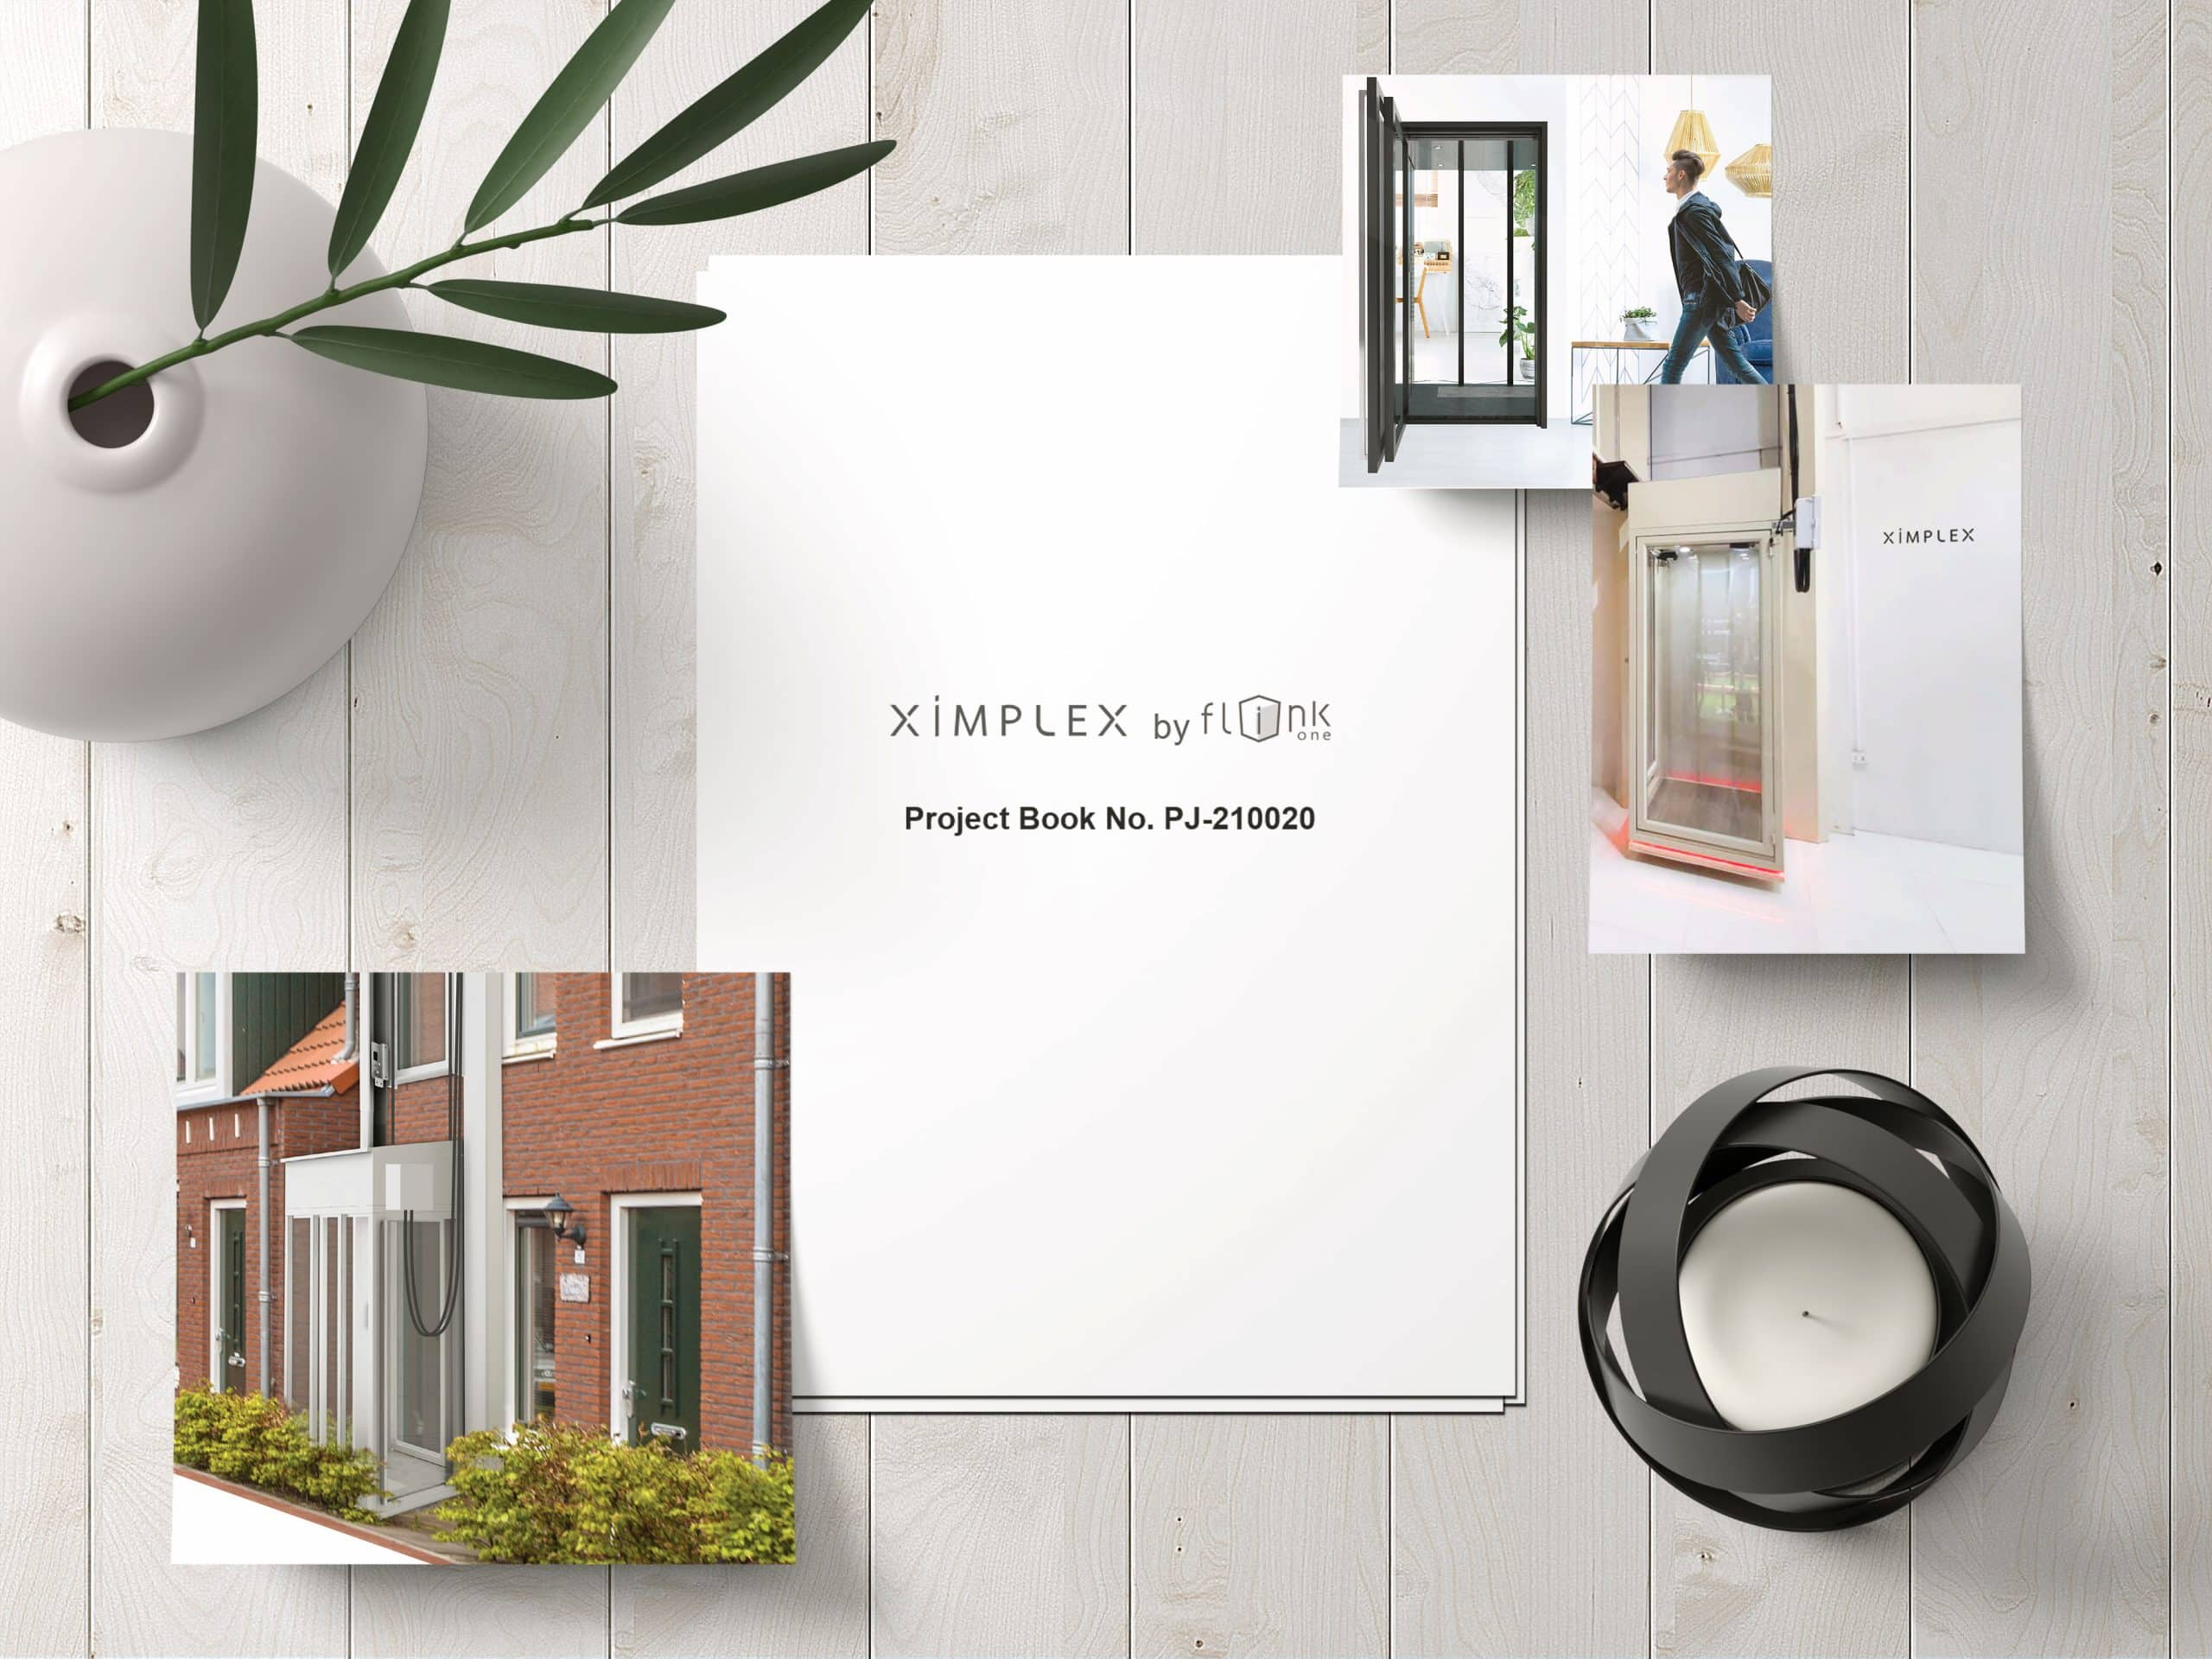 Project Book โครงการ สรุป ลิฟต์บ้าน